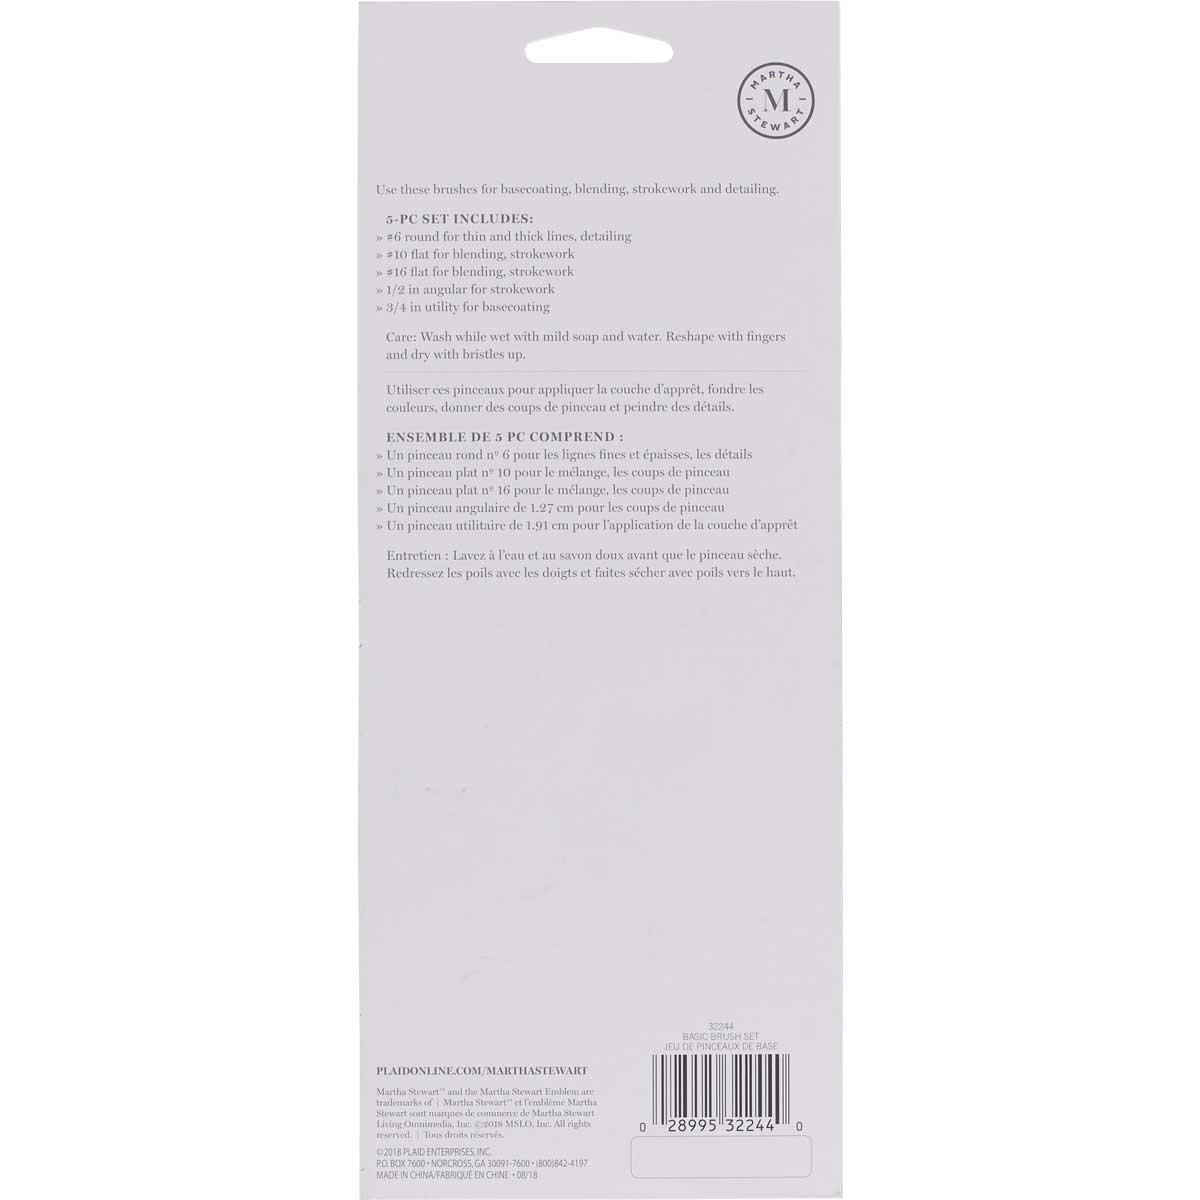 Martha Stewart ® Brush Sets - Basic Brush Set - 5 pc. - 32244